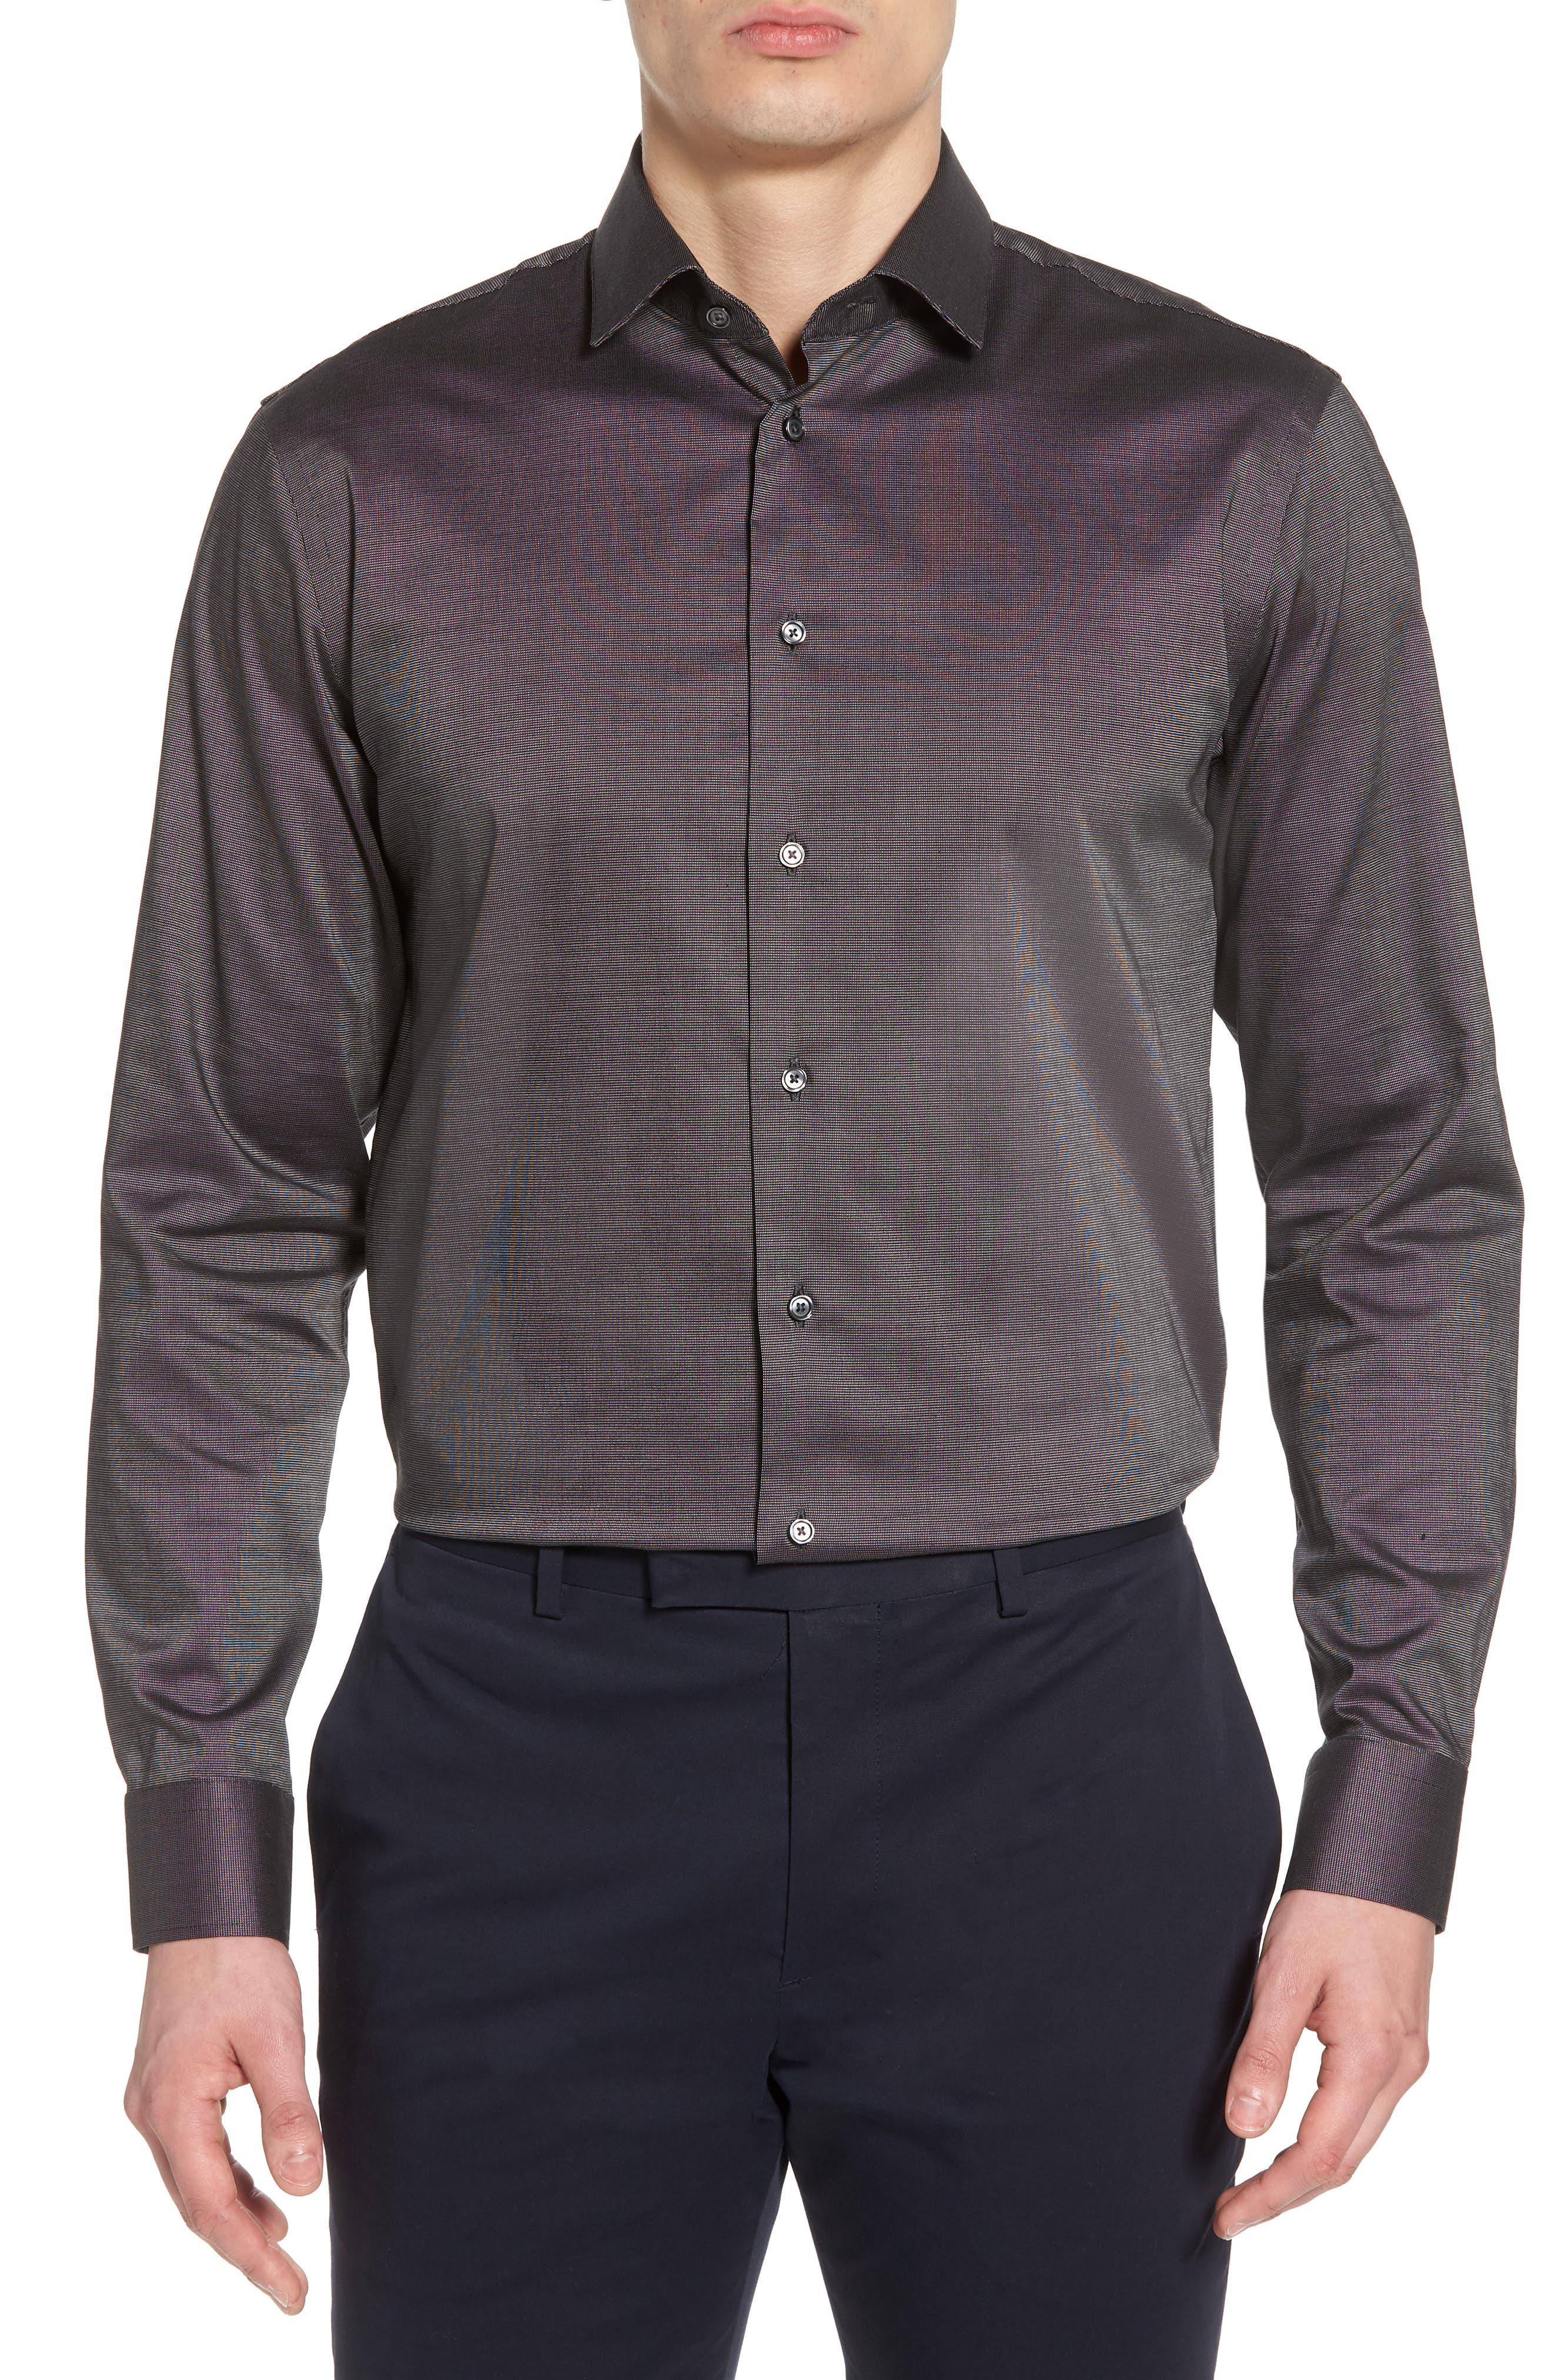 Trim Fit Stretch Solid Dress Shirt,                         Main,                         color, Black Jet